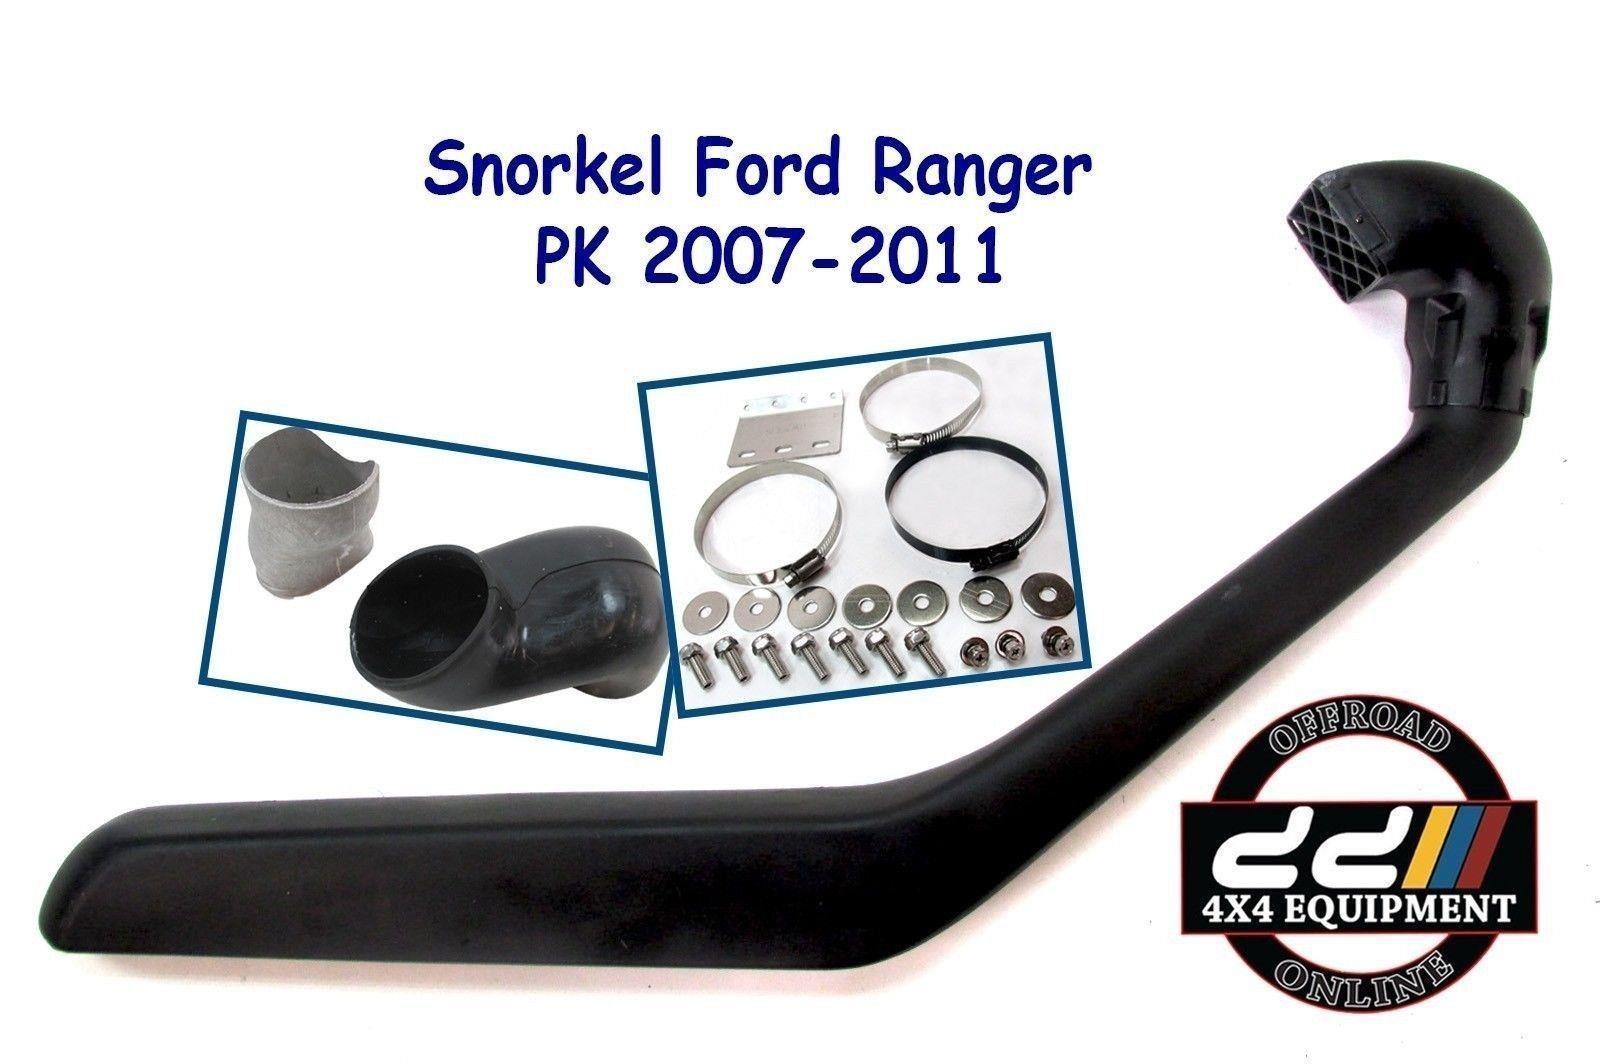 USエア インテーク シュノーケル フォードレンジャーPJ PKマツダBT50 3.0Lディーゼルエアラムスノーケルインテークキット07-11 For Ford Ranger PJ PK Mazda BT50 3.0L Diesel Air Ram Snorkel Intake Kit 07-11